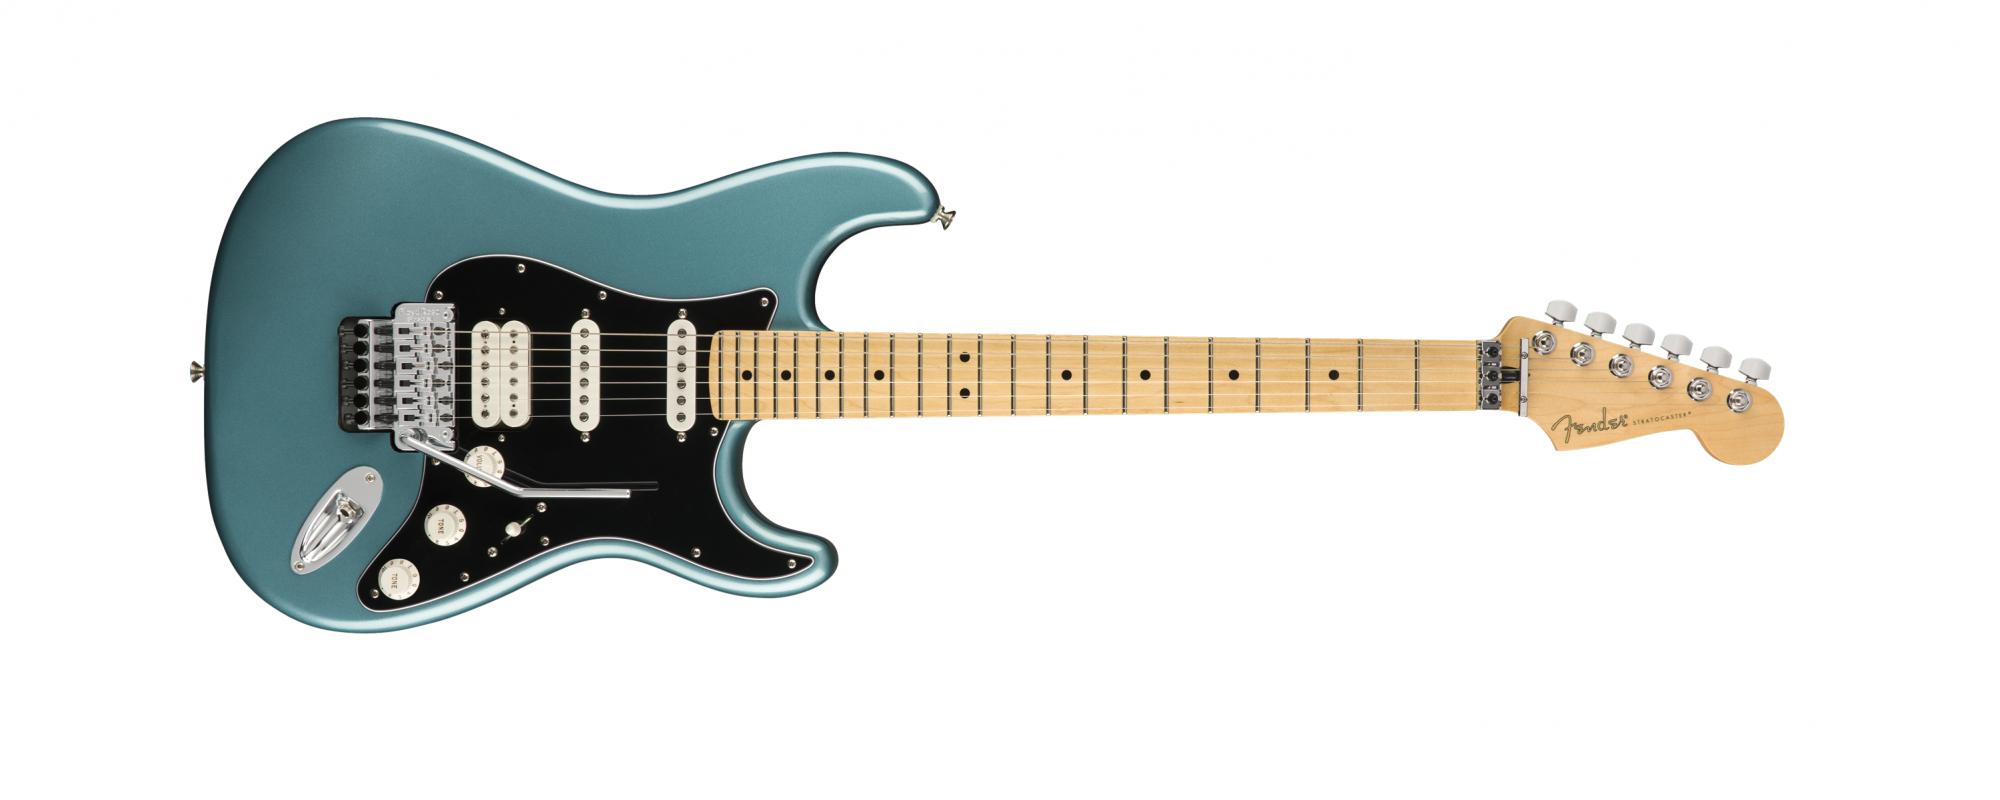 Fender Player Stratocaster Floyd Rose, MN, Tidepool